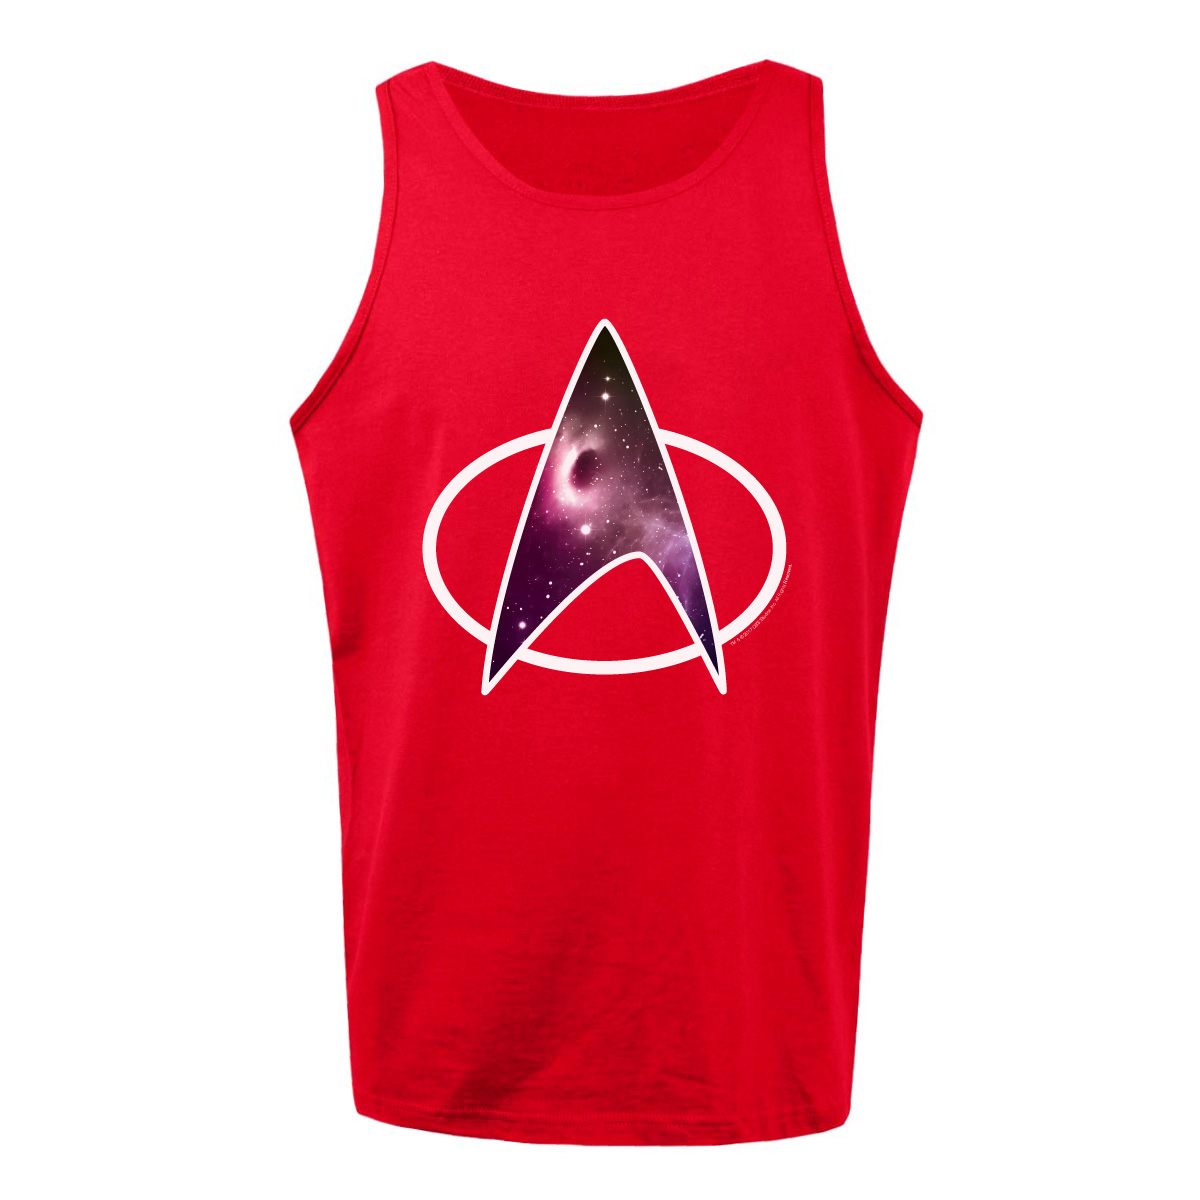 Star Trek The Next Generation Space Delta Tank